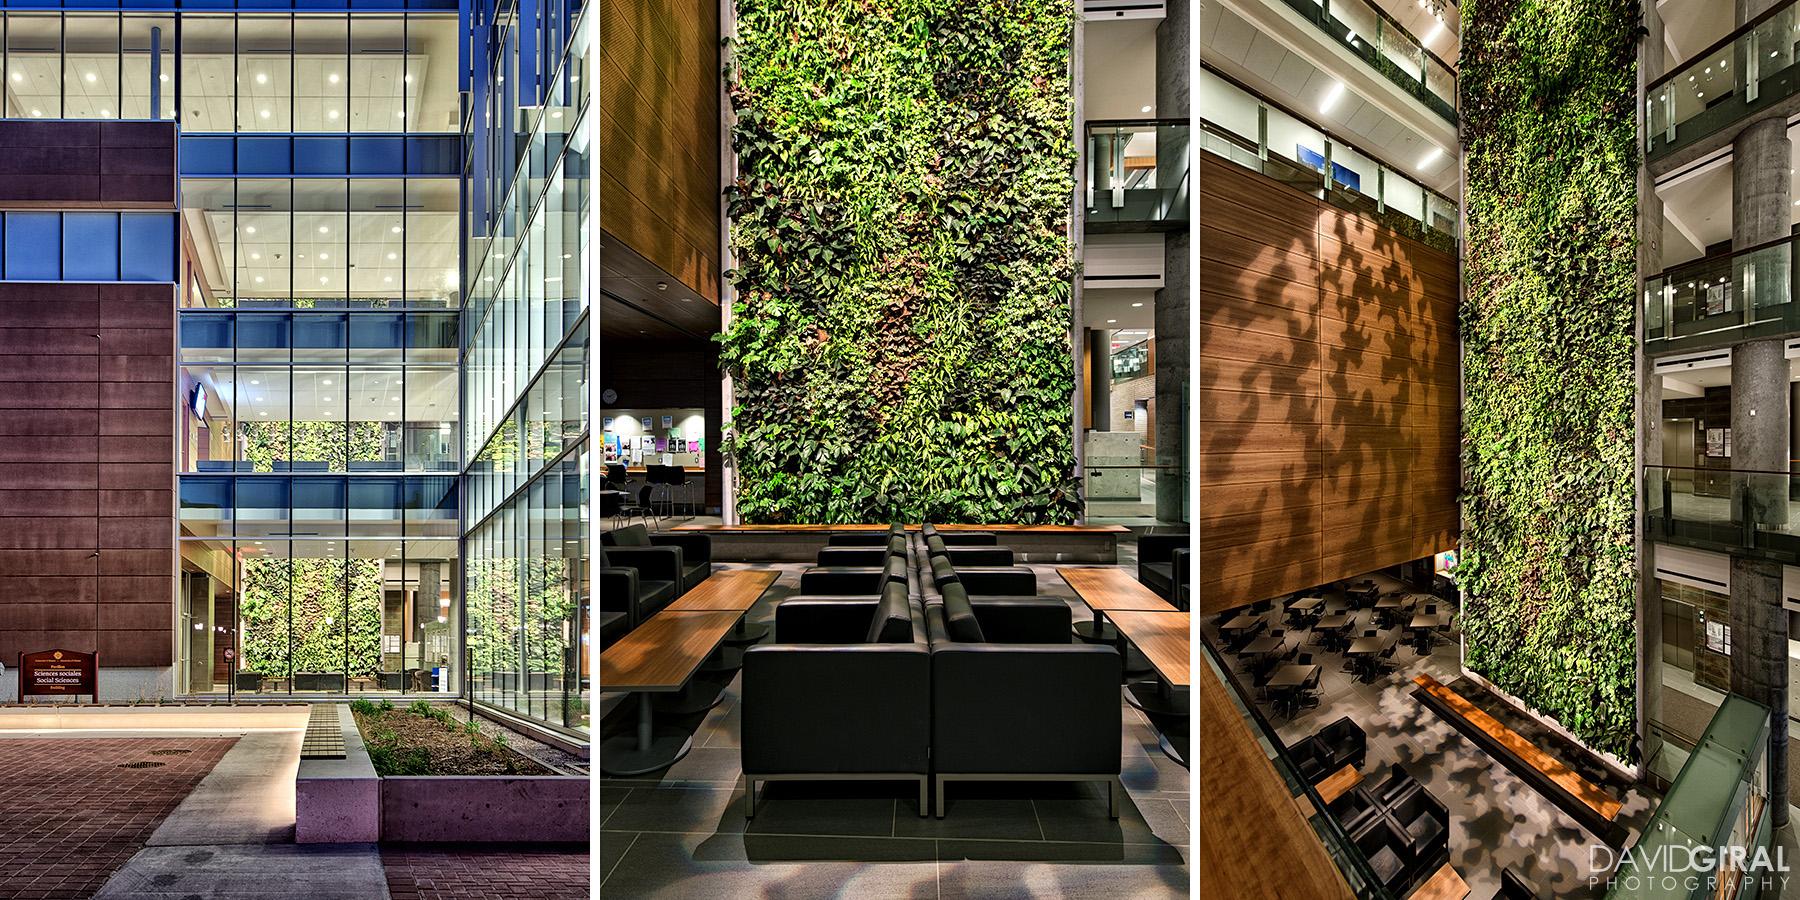 14 Best Shopping Mall Images On Pinterest Arquitetura Amazing